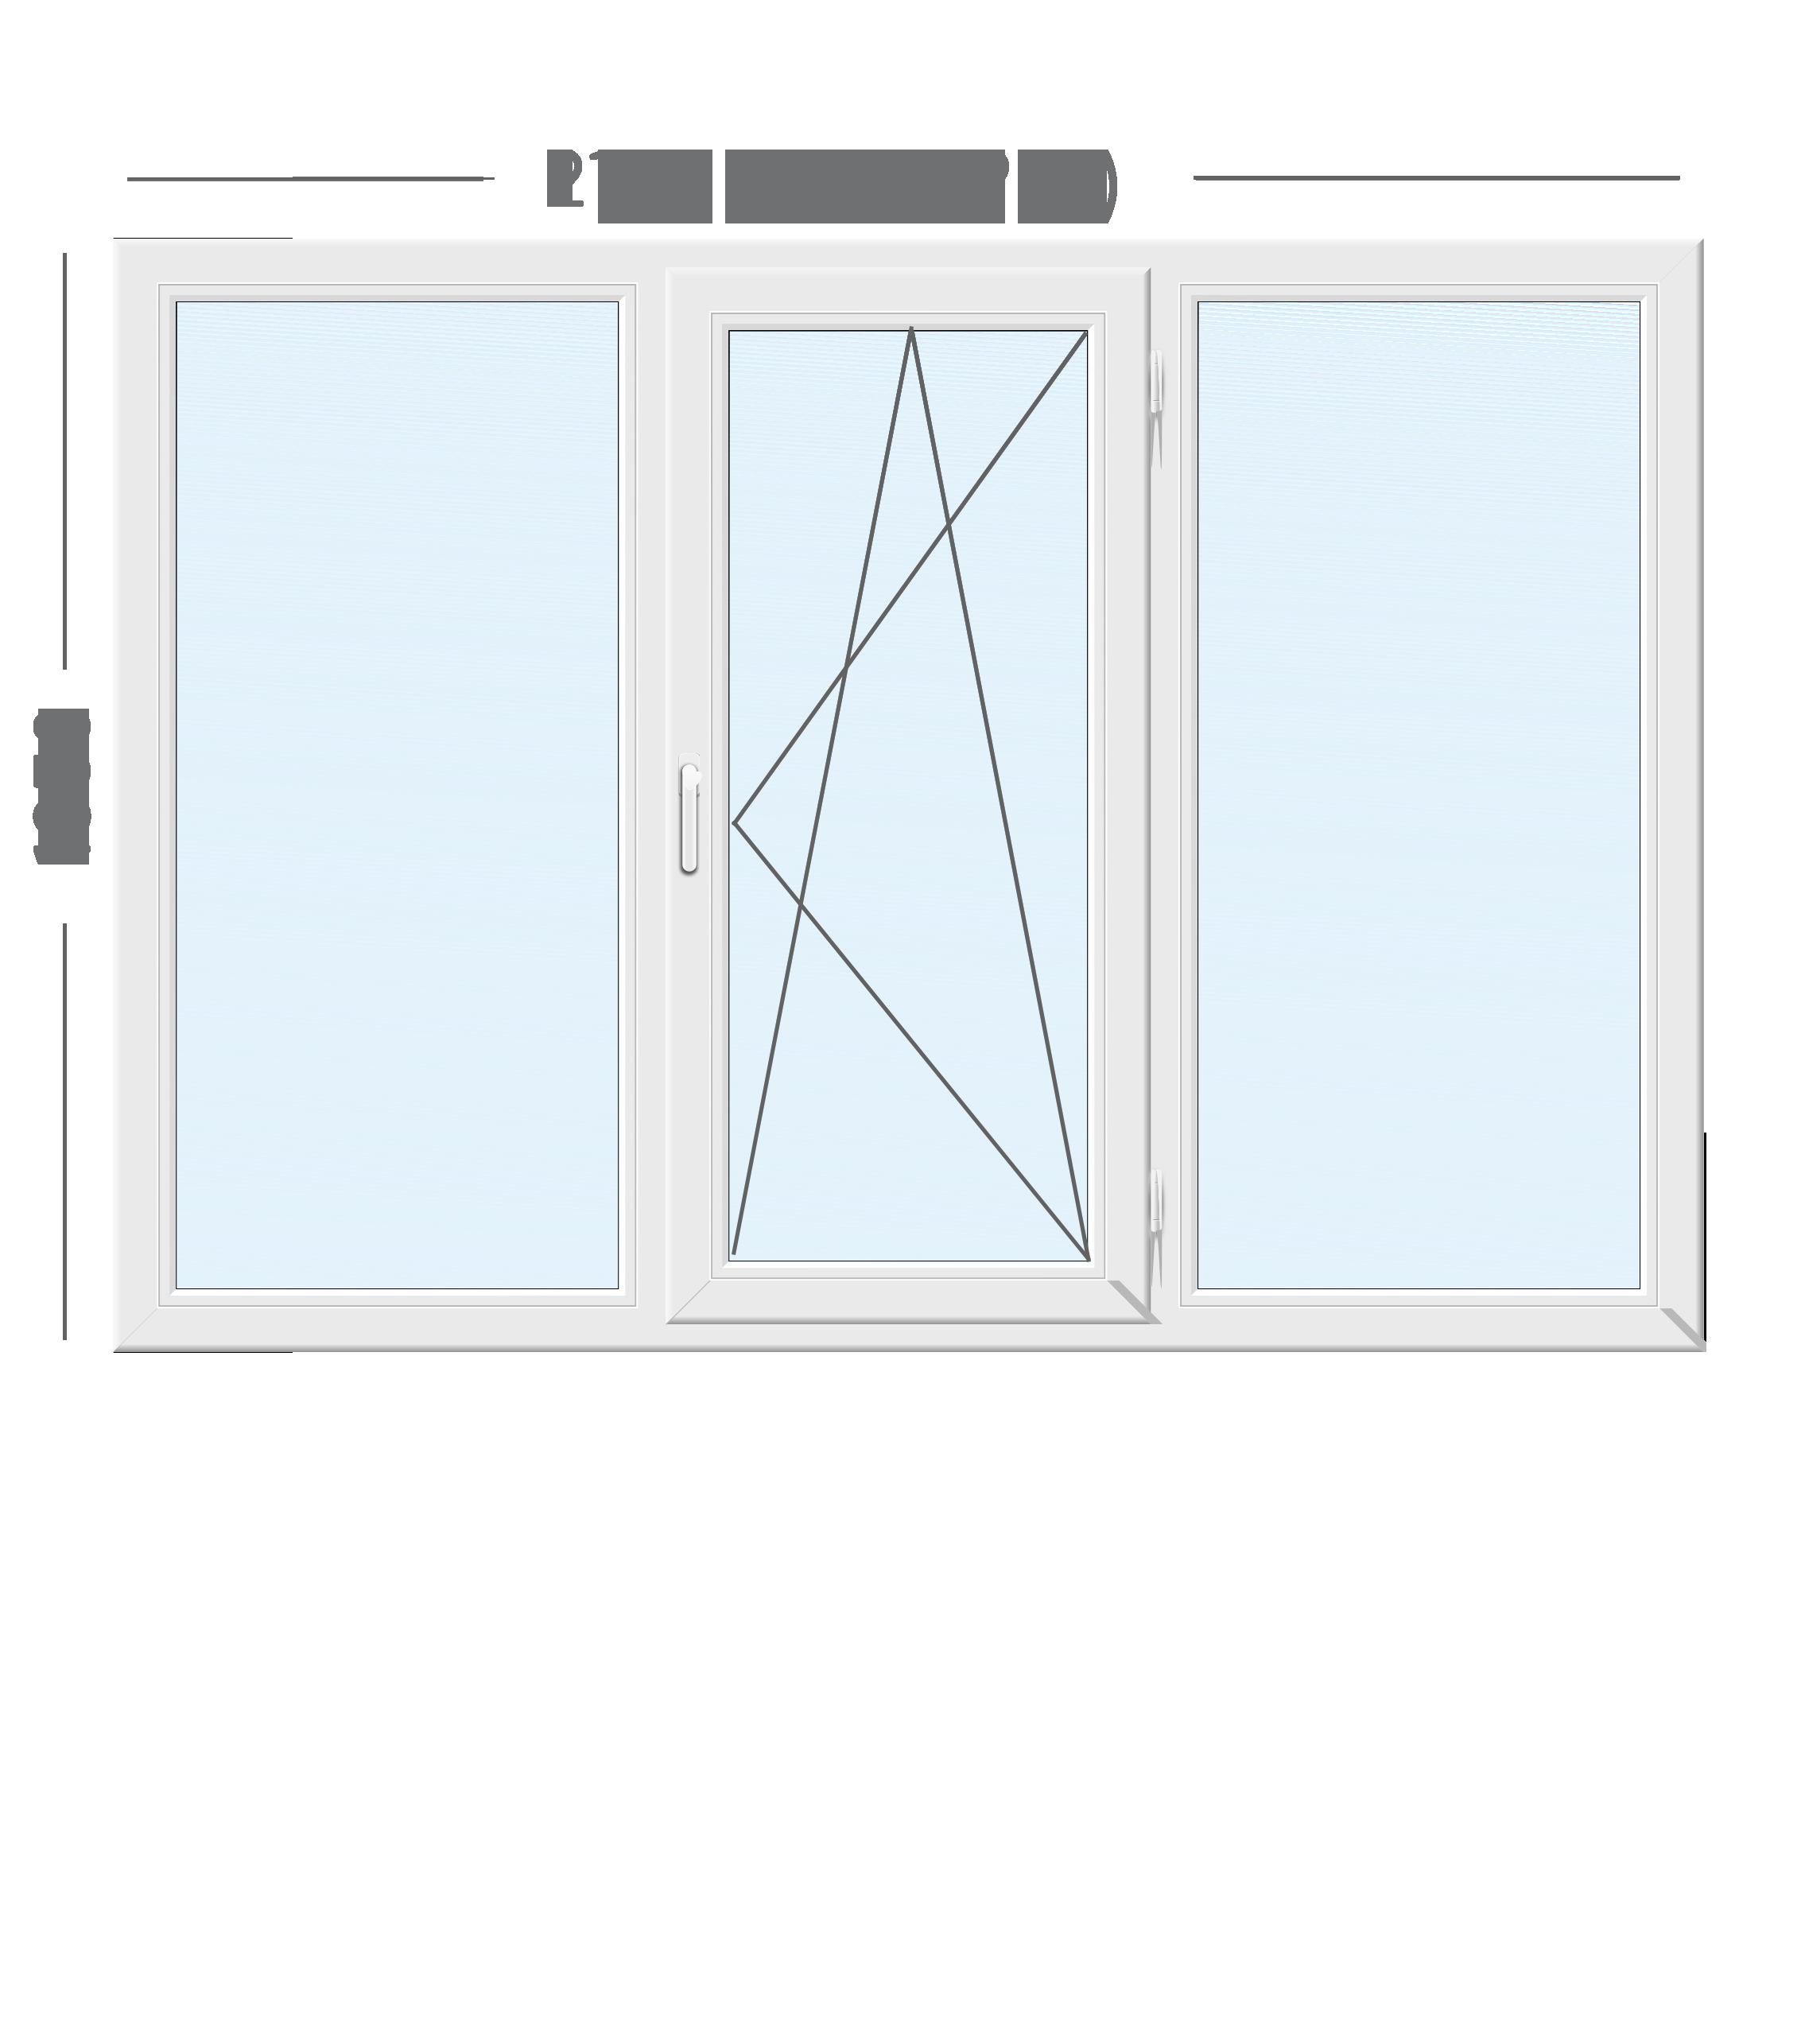 Трехстворчатое окно WDS Galaxy с фурнитурой VORNE (Турция)